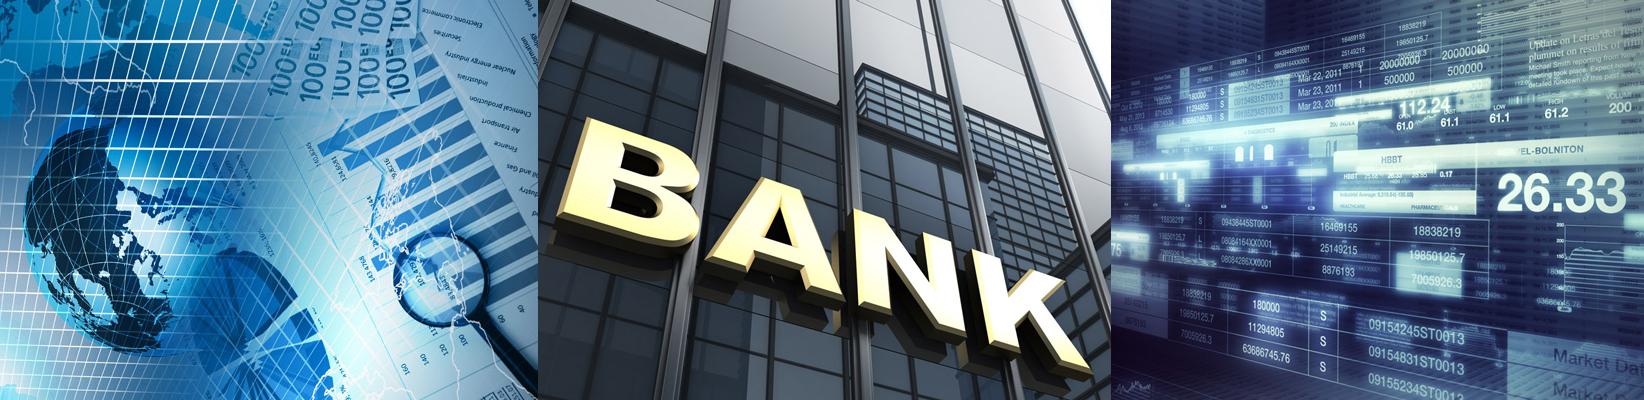 european retail bank